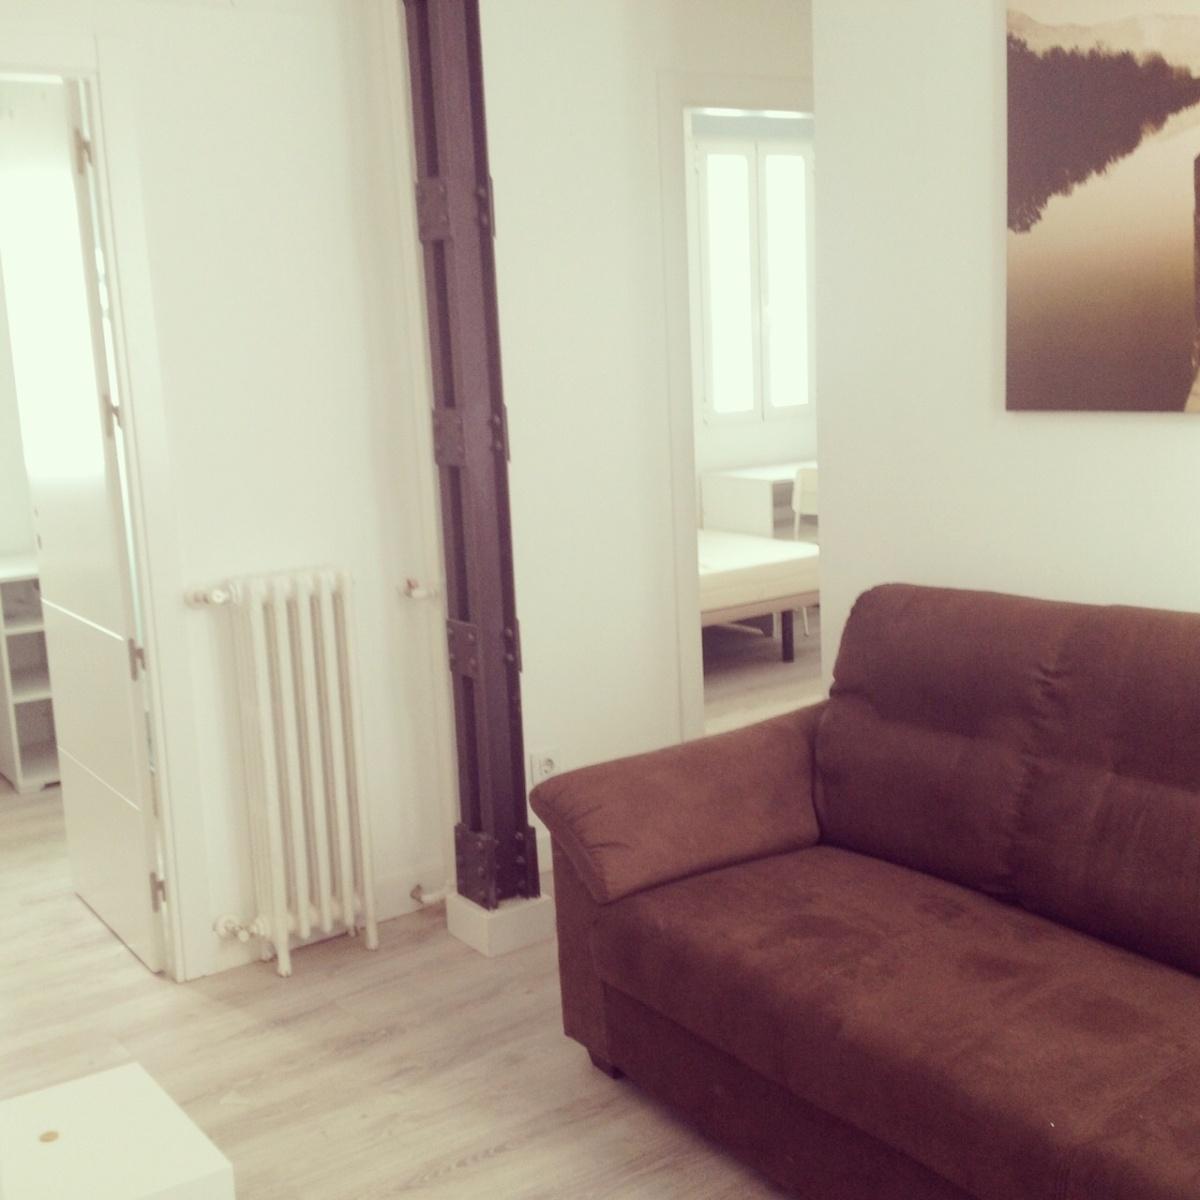 Alquiler piso para estudiante madrid nova te asesora - Alquiler de pisos para estudiantes en madrid capital ...